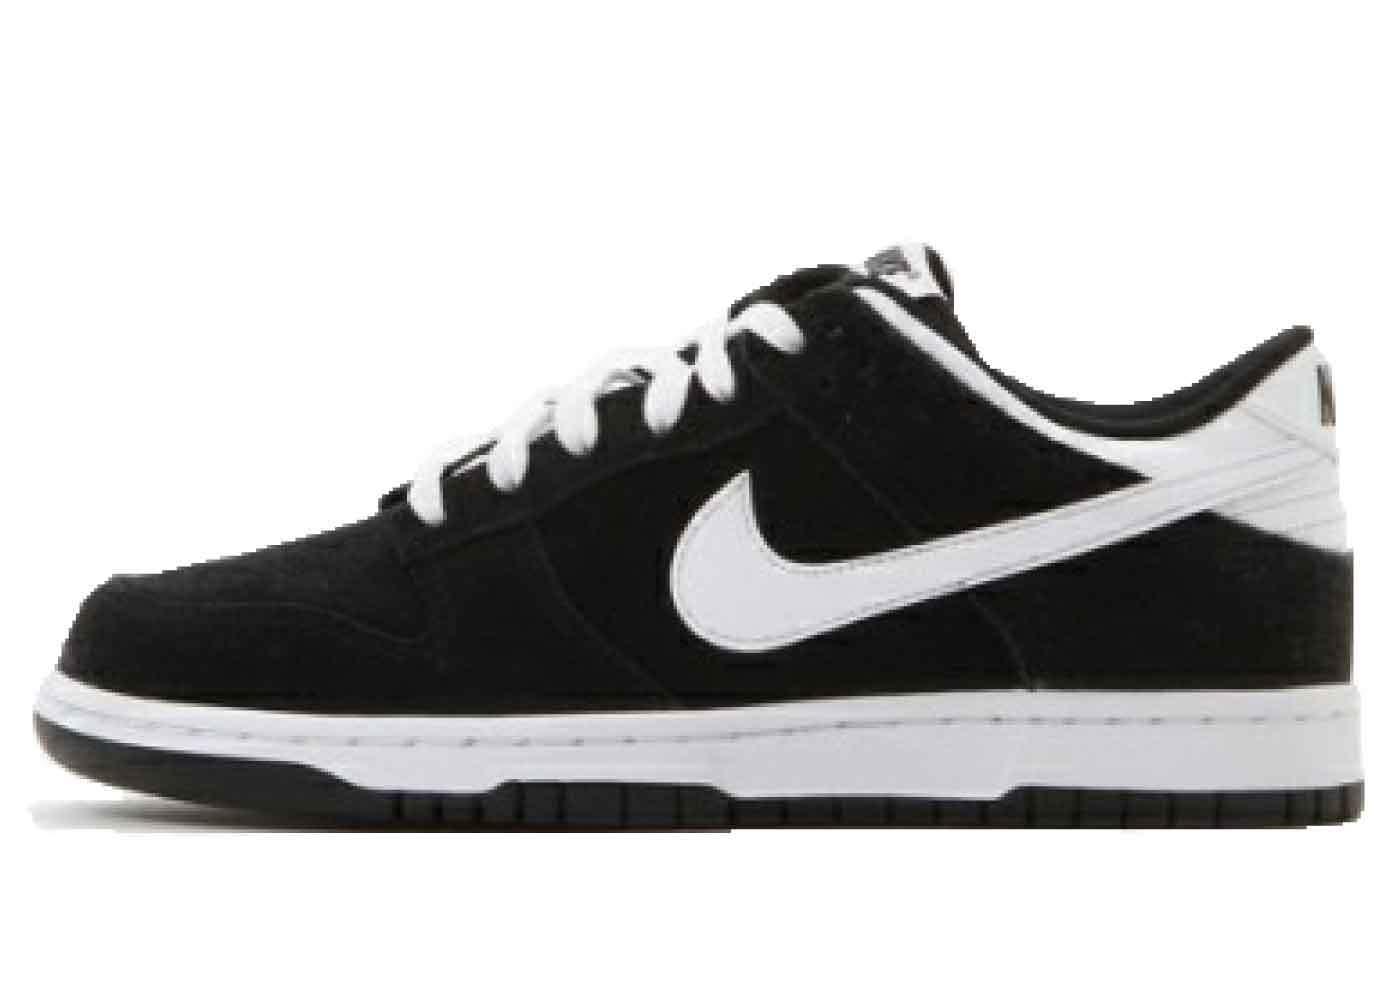 Nike Dunk Low Black Whiteの写真